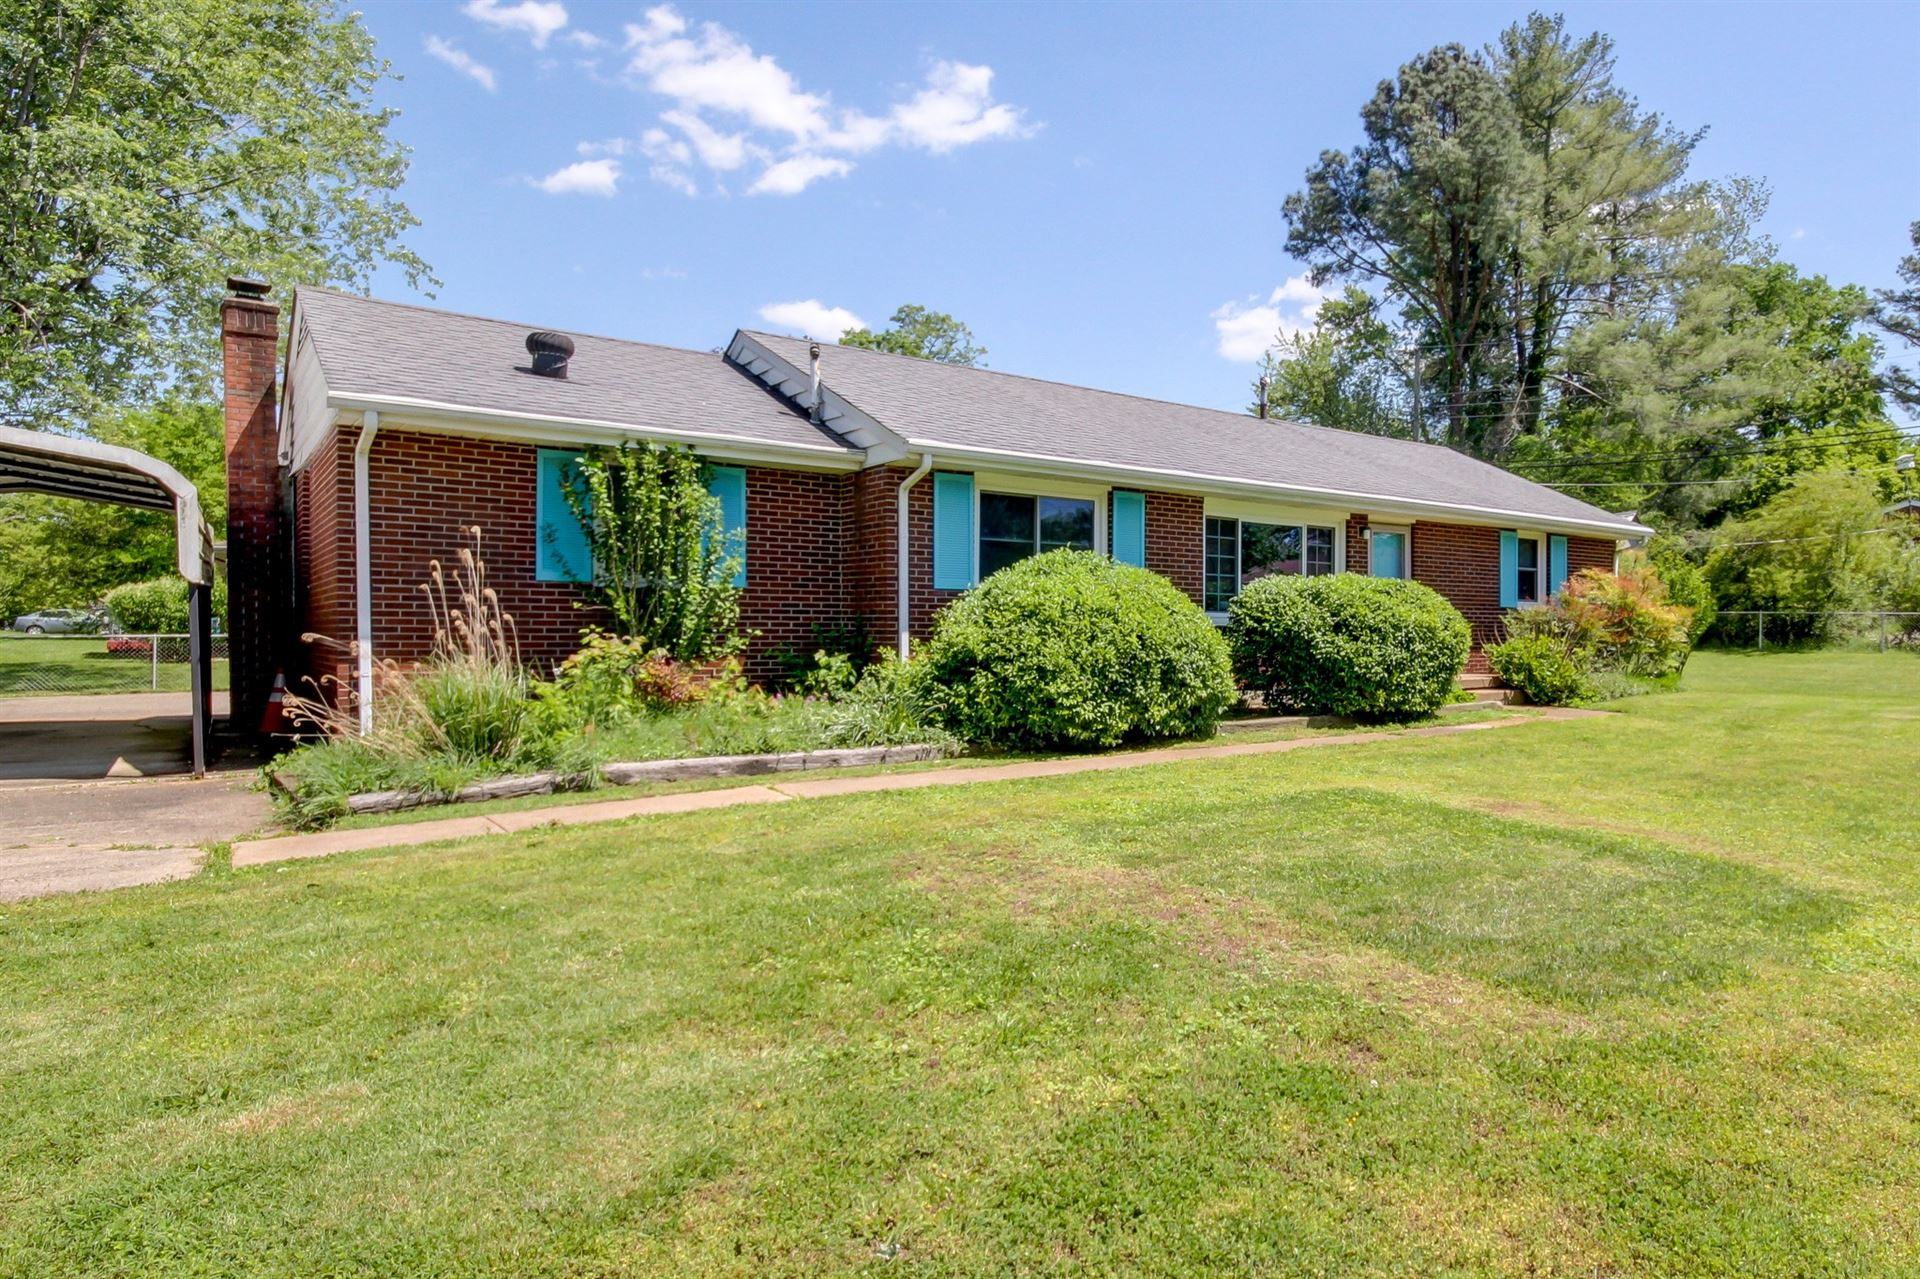 12 Jana Dr, Clarksville, TN 37042 - MLS#: 2253885